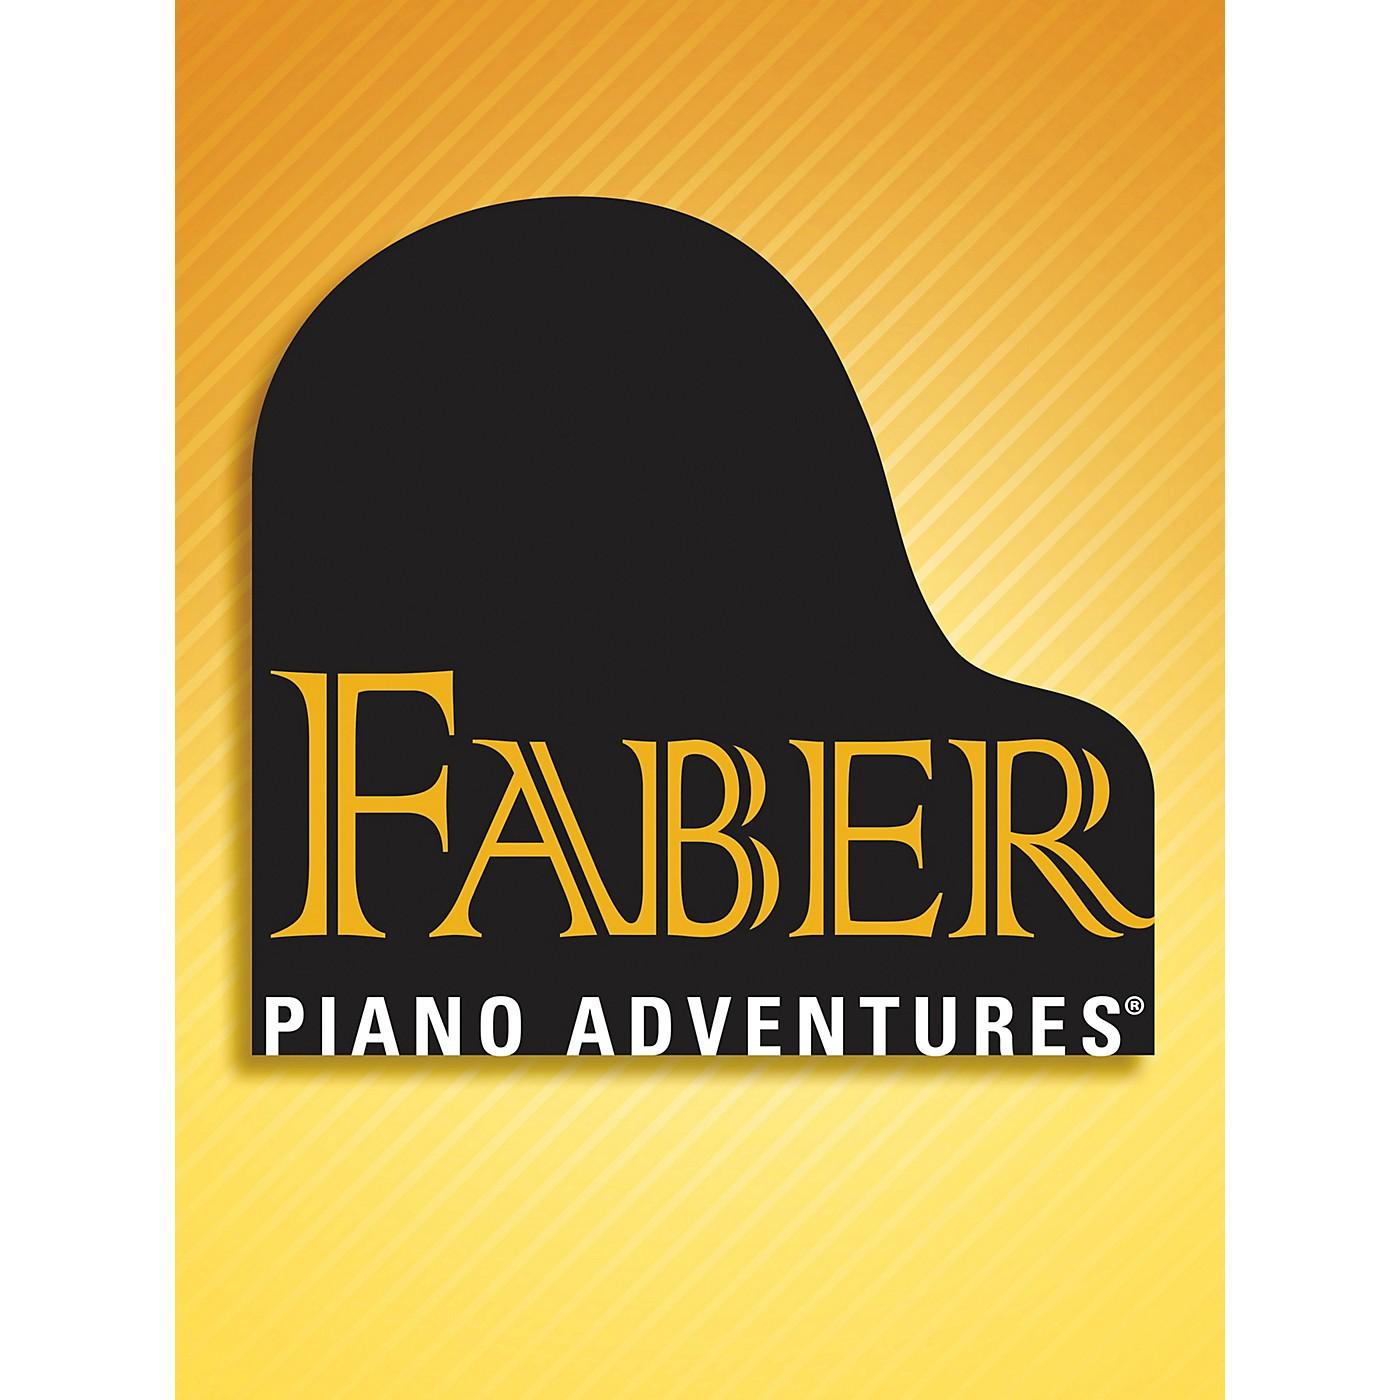 Faber Piano Adventures Level 4 - Popular Repertoire MIDI Disk Faber Piano Adventures® Series Disk by Nancy Faber thumbnail